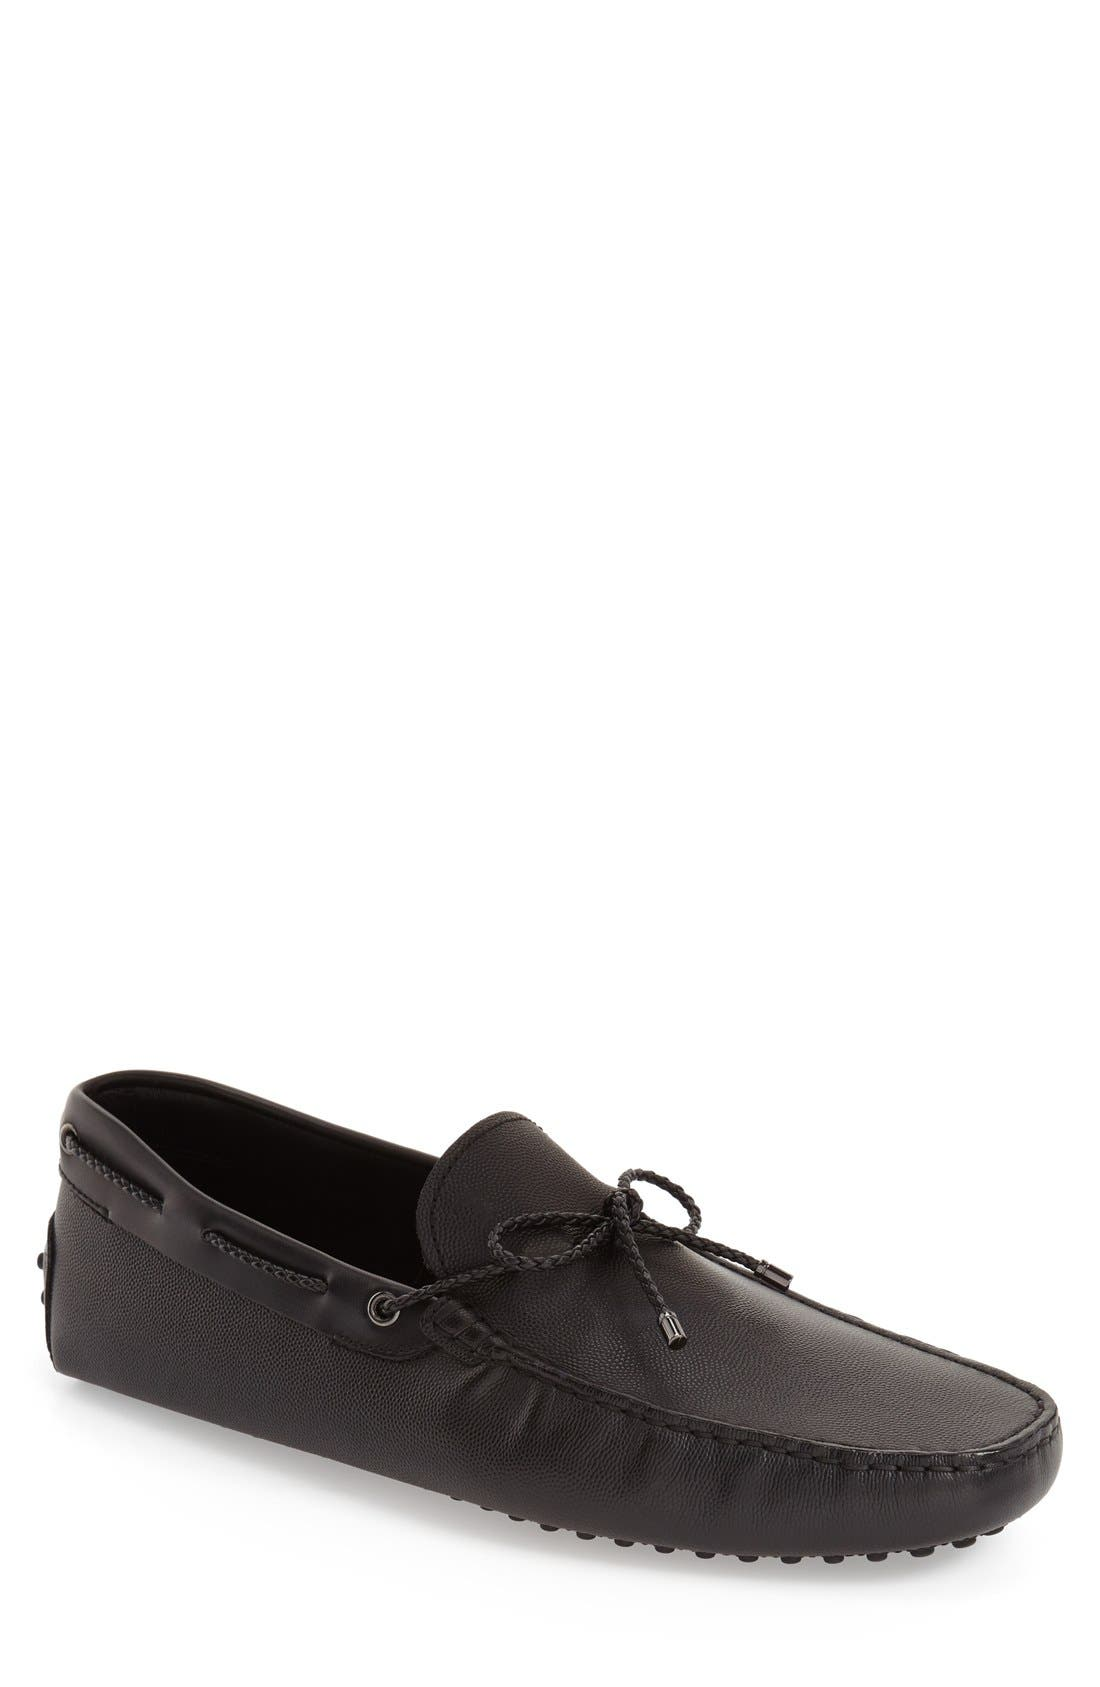 Tods Gommini Driving Shoe (Men)